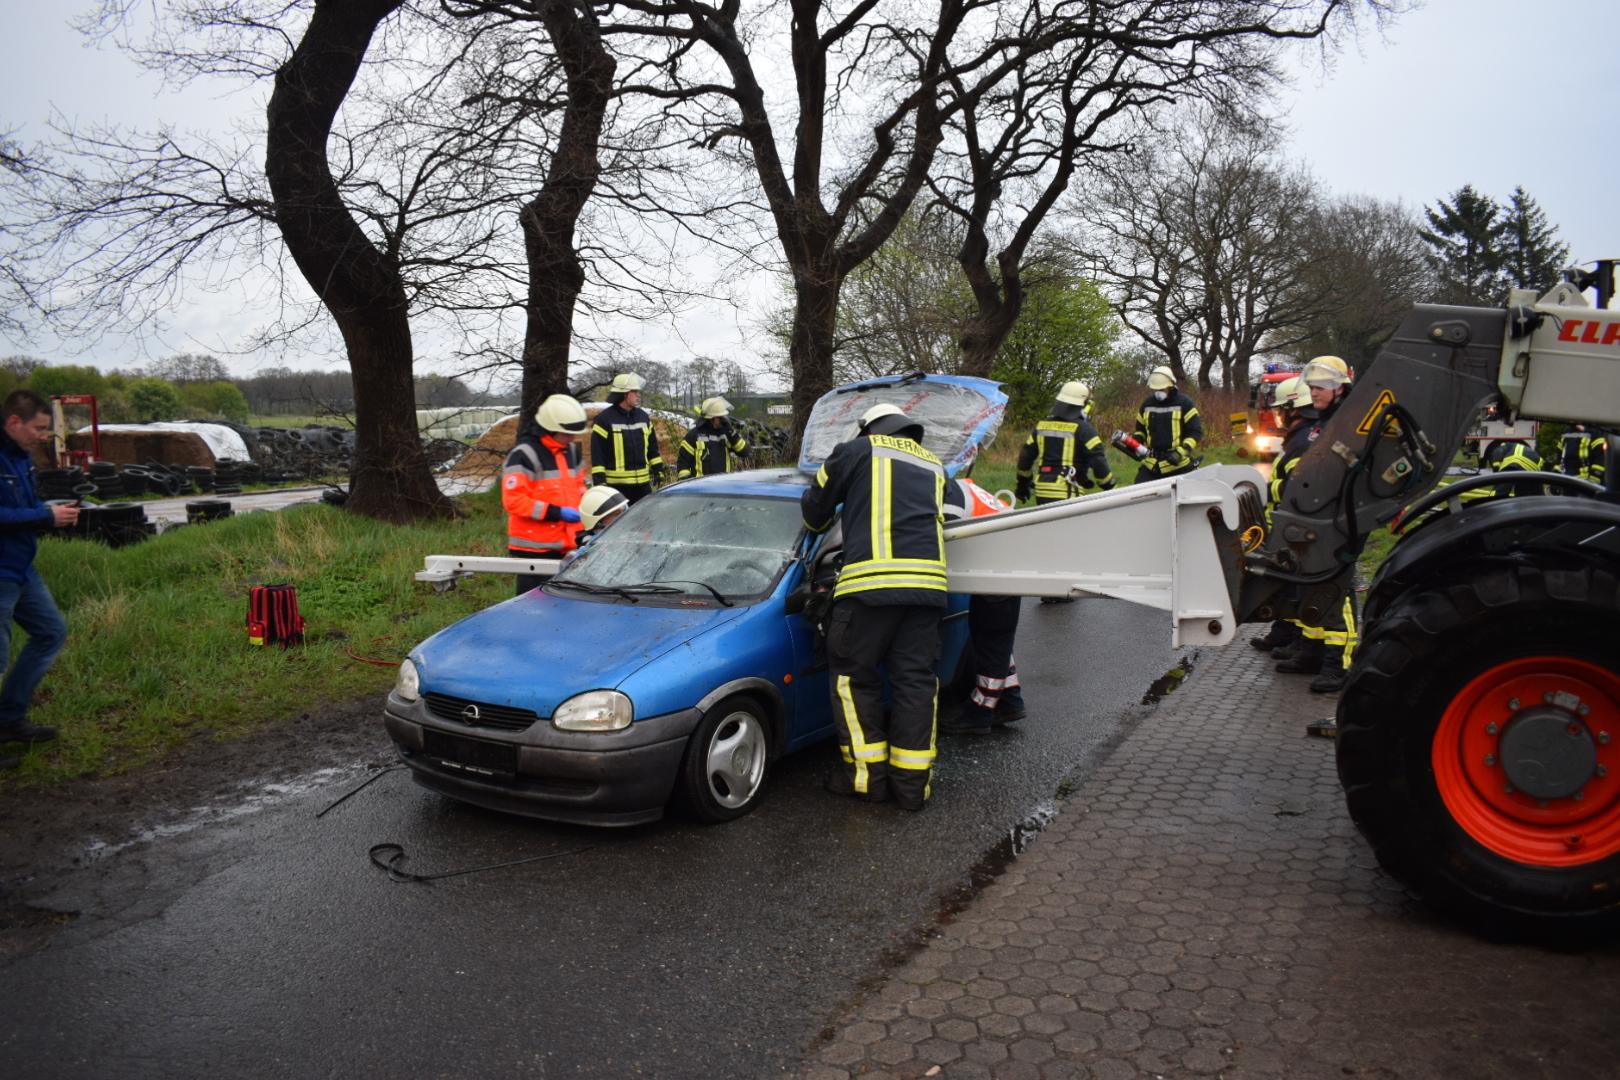 Am 12.04.2017 um 19:26 Uhr – Einsatzübung: Verkehrsunfall in Godensholt